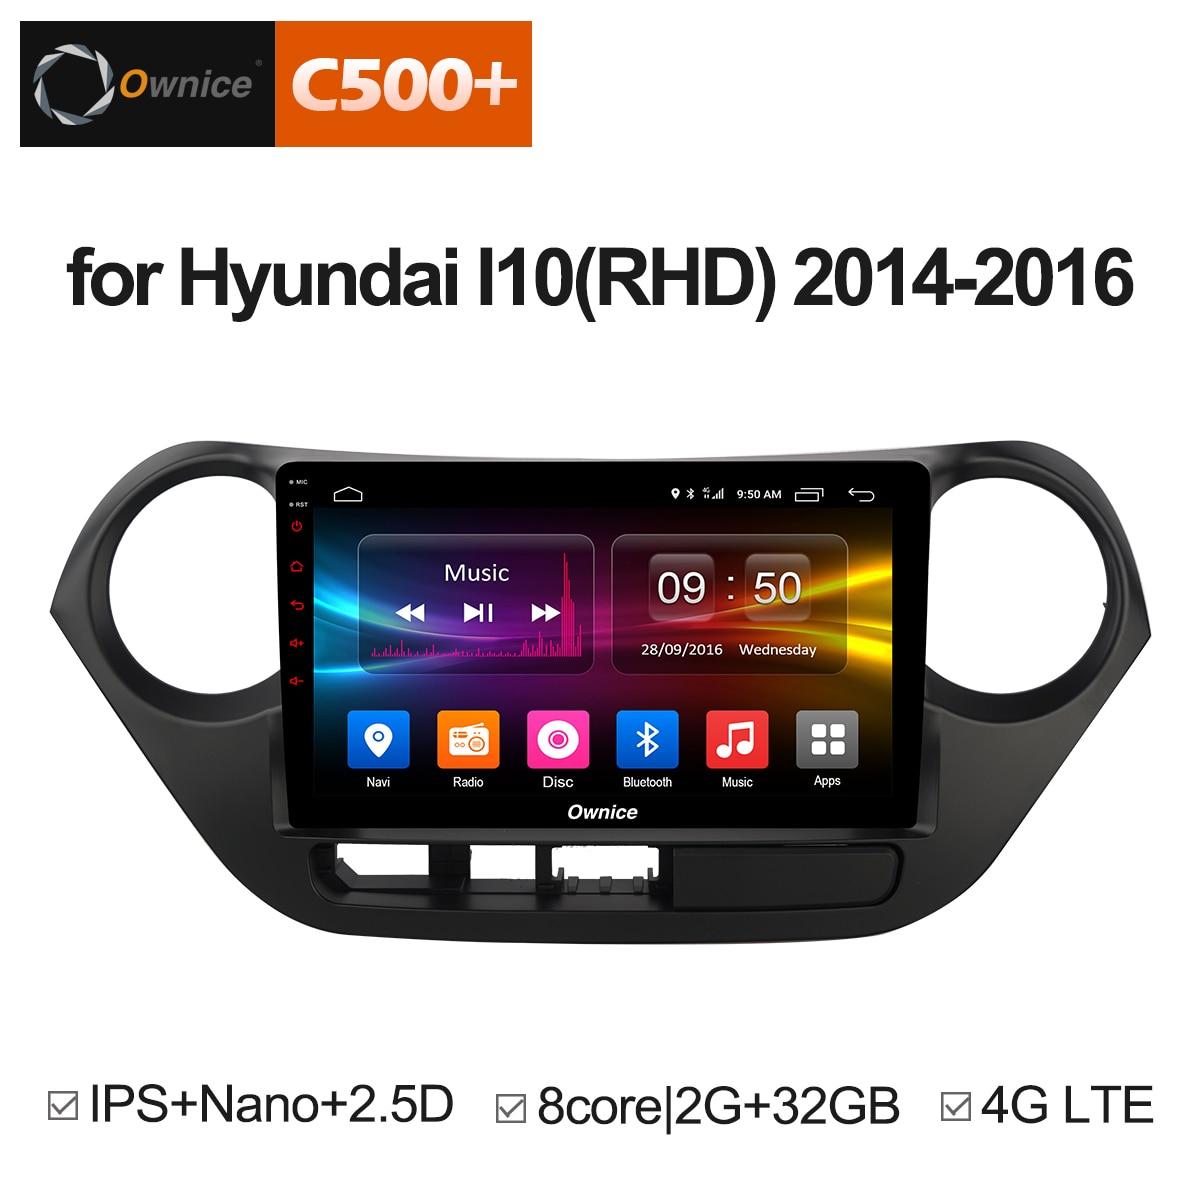 For HYUNDAI 2014 2015 2016 Grand I10 RHD or LHD Vehicle Android 1 2 din Radio auto GPS Navigator Radio Multimedia Car Player